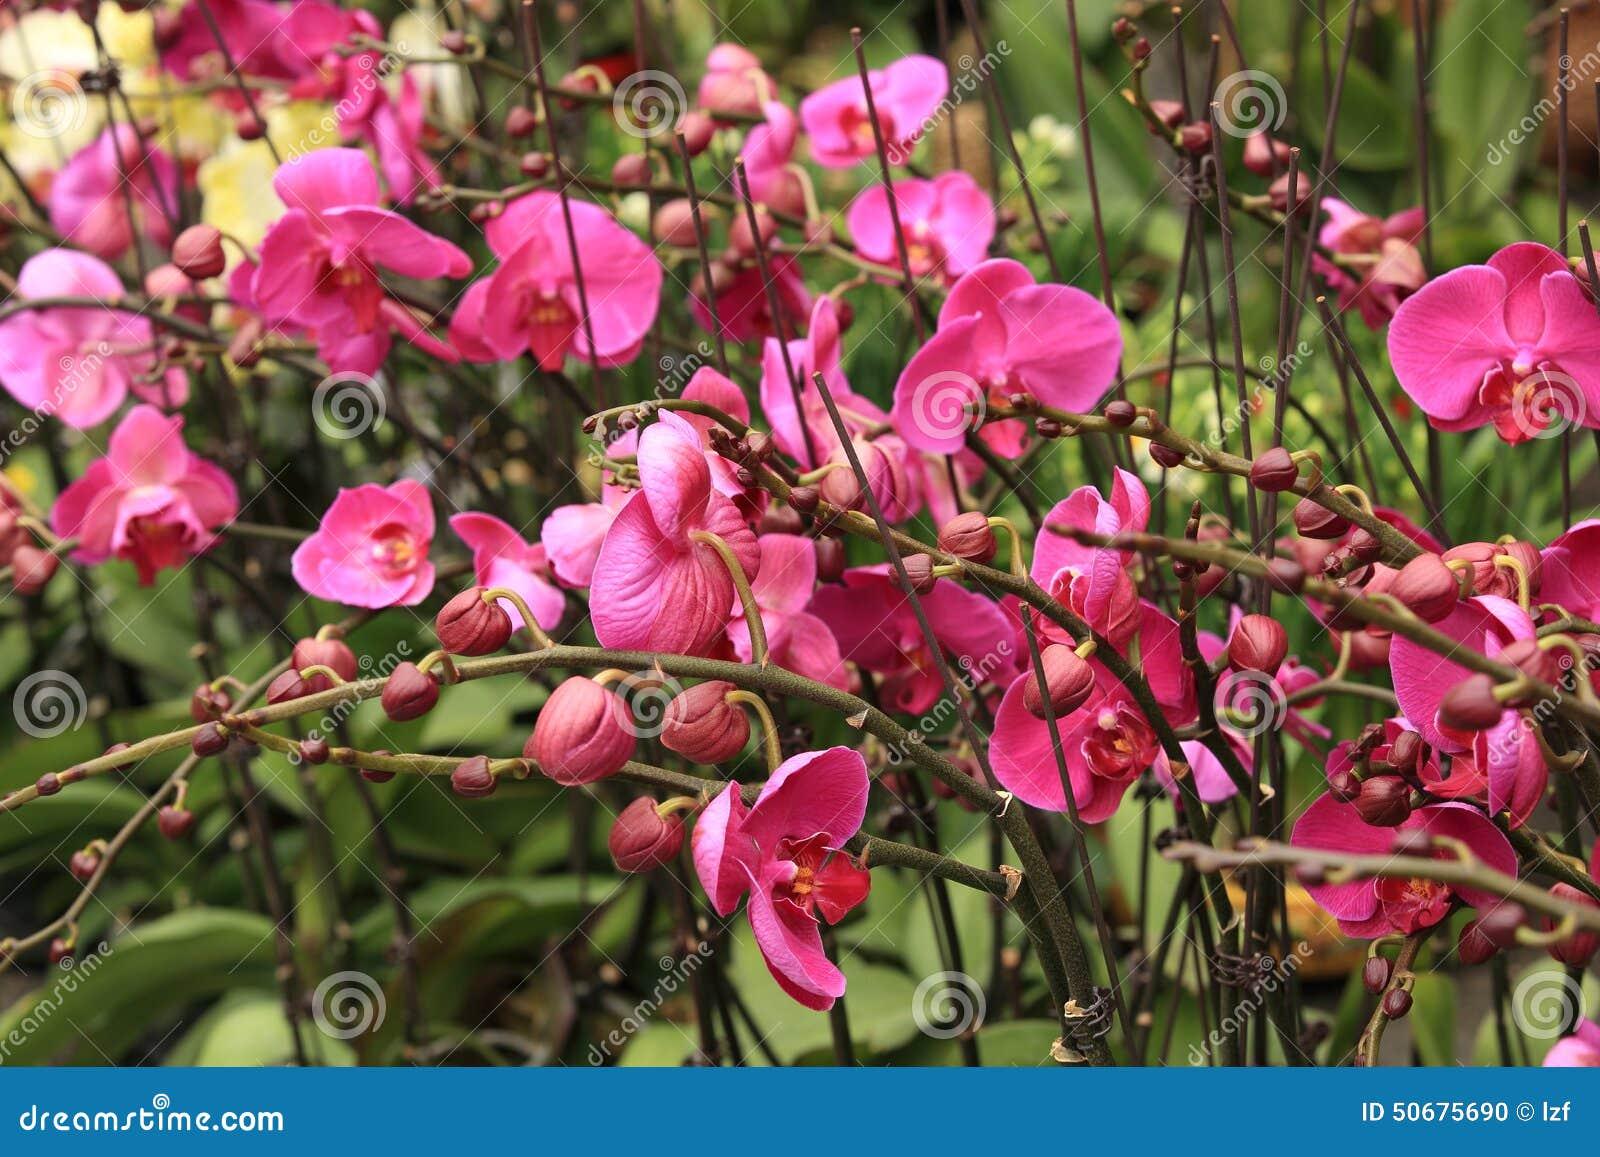 Download 美好的兰花兰花植物 库存照片. 图片 包括有 室外, 庭院, 蝴蝶, 胸衣, 投反对票, 杂种, 花卉, 绽放 - 50675690